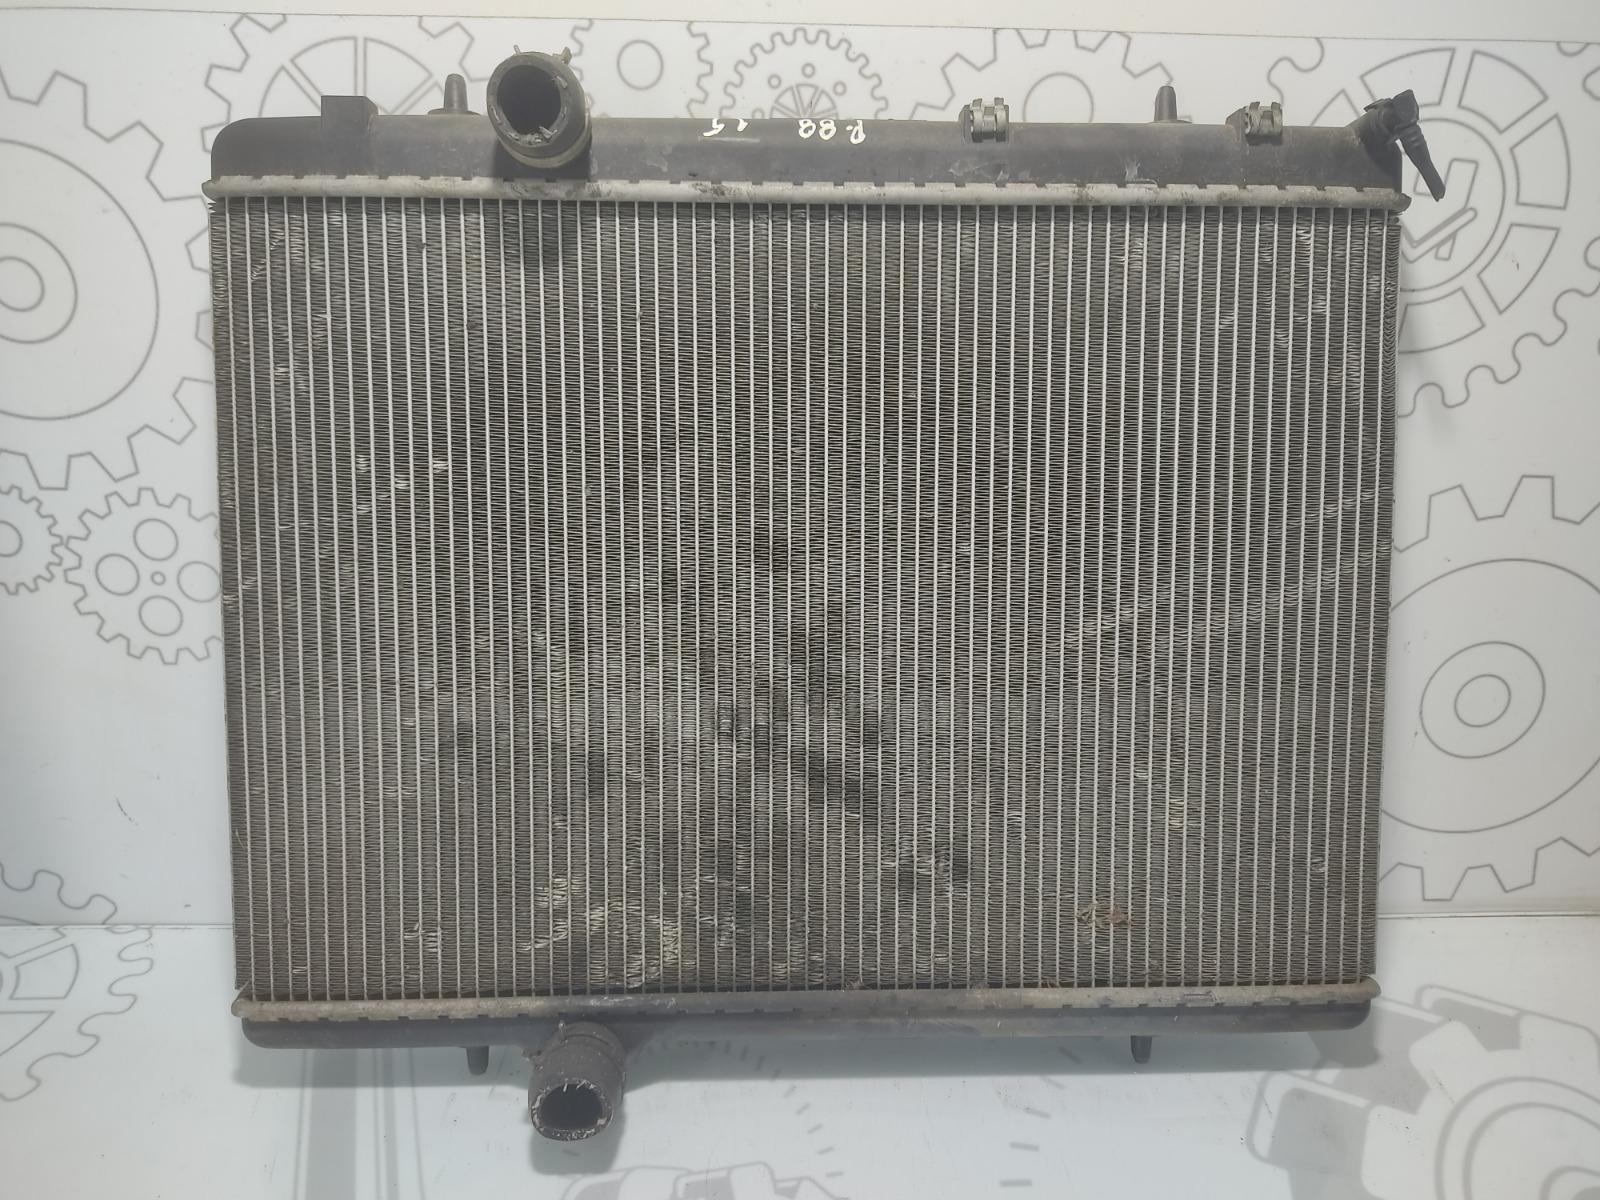 Радиатор (основной) Citroen Xsara Picasso 1.6 HDI 2007 (б/у)